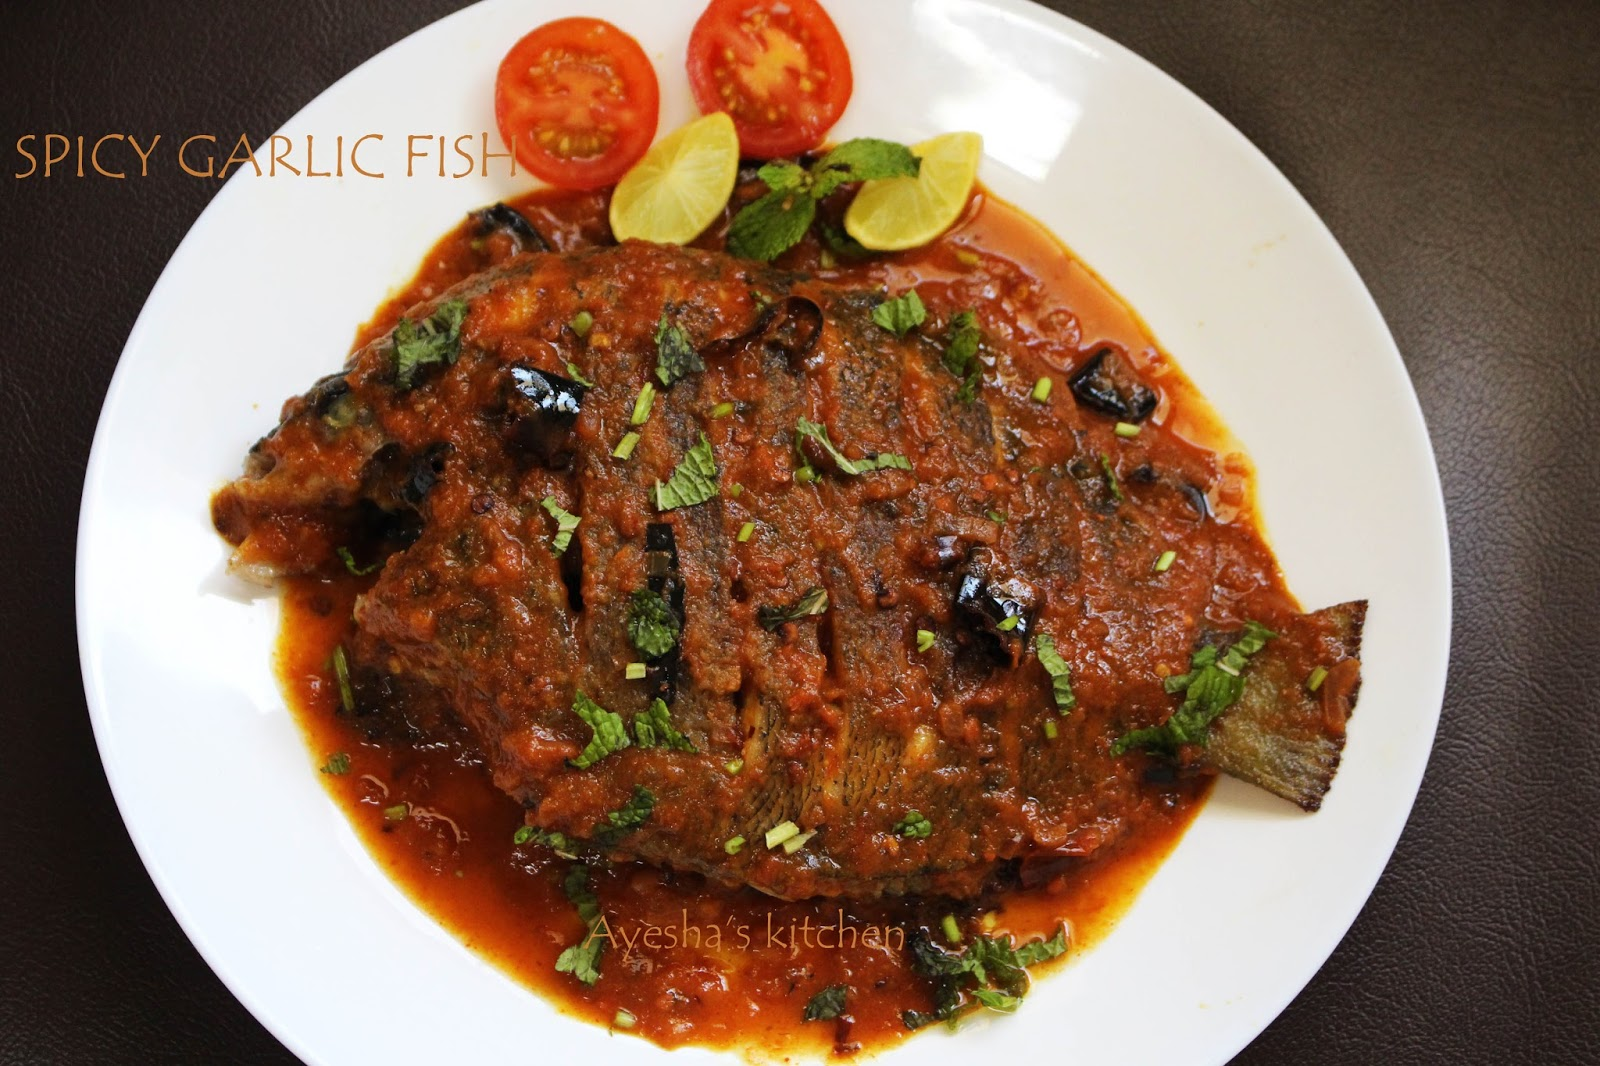 Fish recipes spicy garlic fish for Garlic sauce for fish